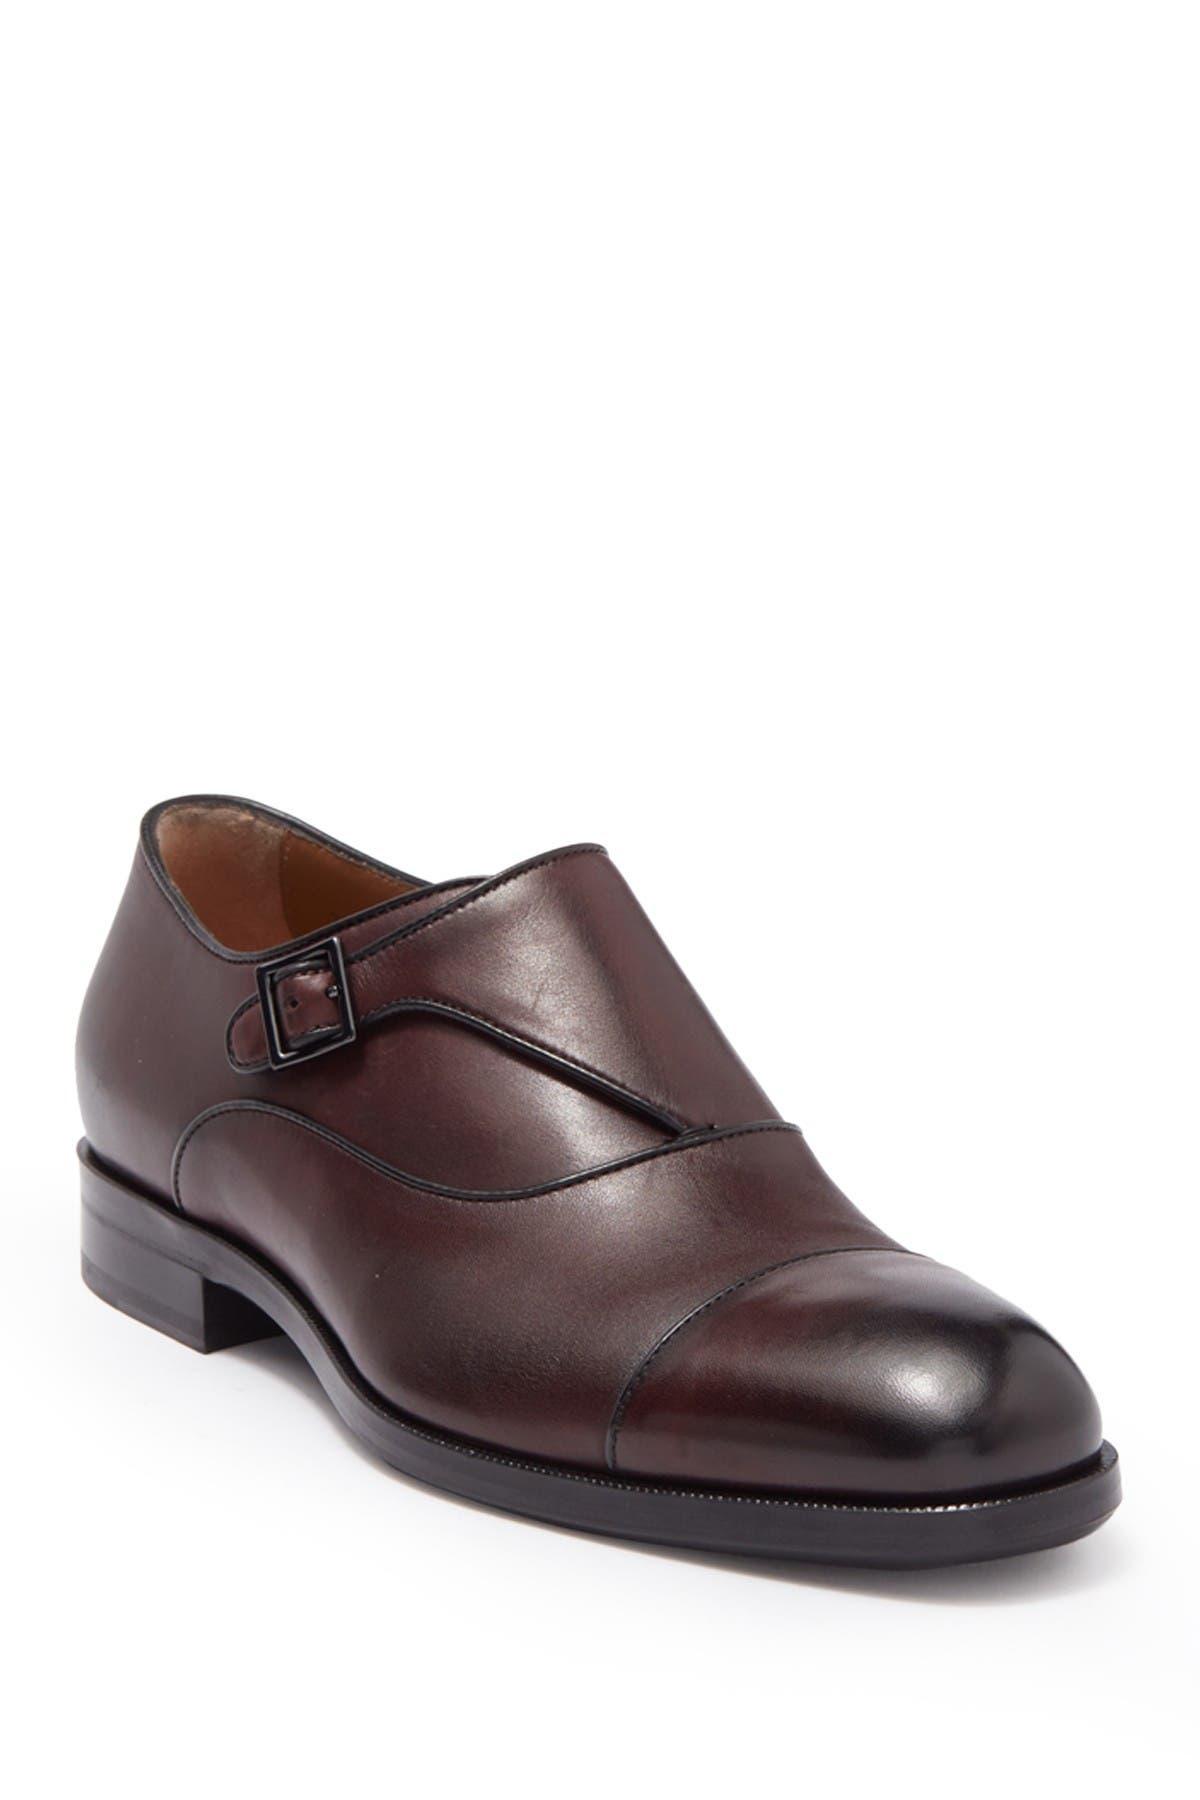 Image of BOSS Stanford Leather Mock Strap Loafer